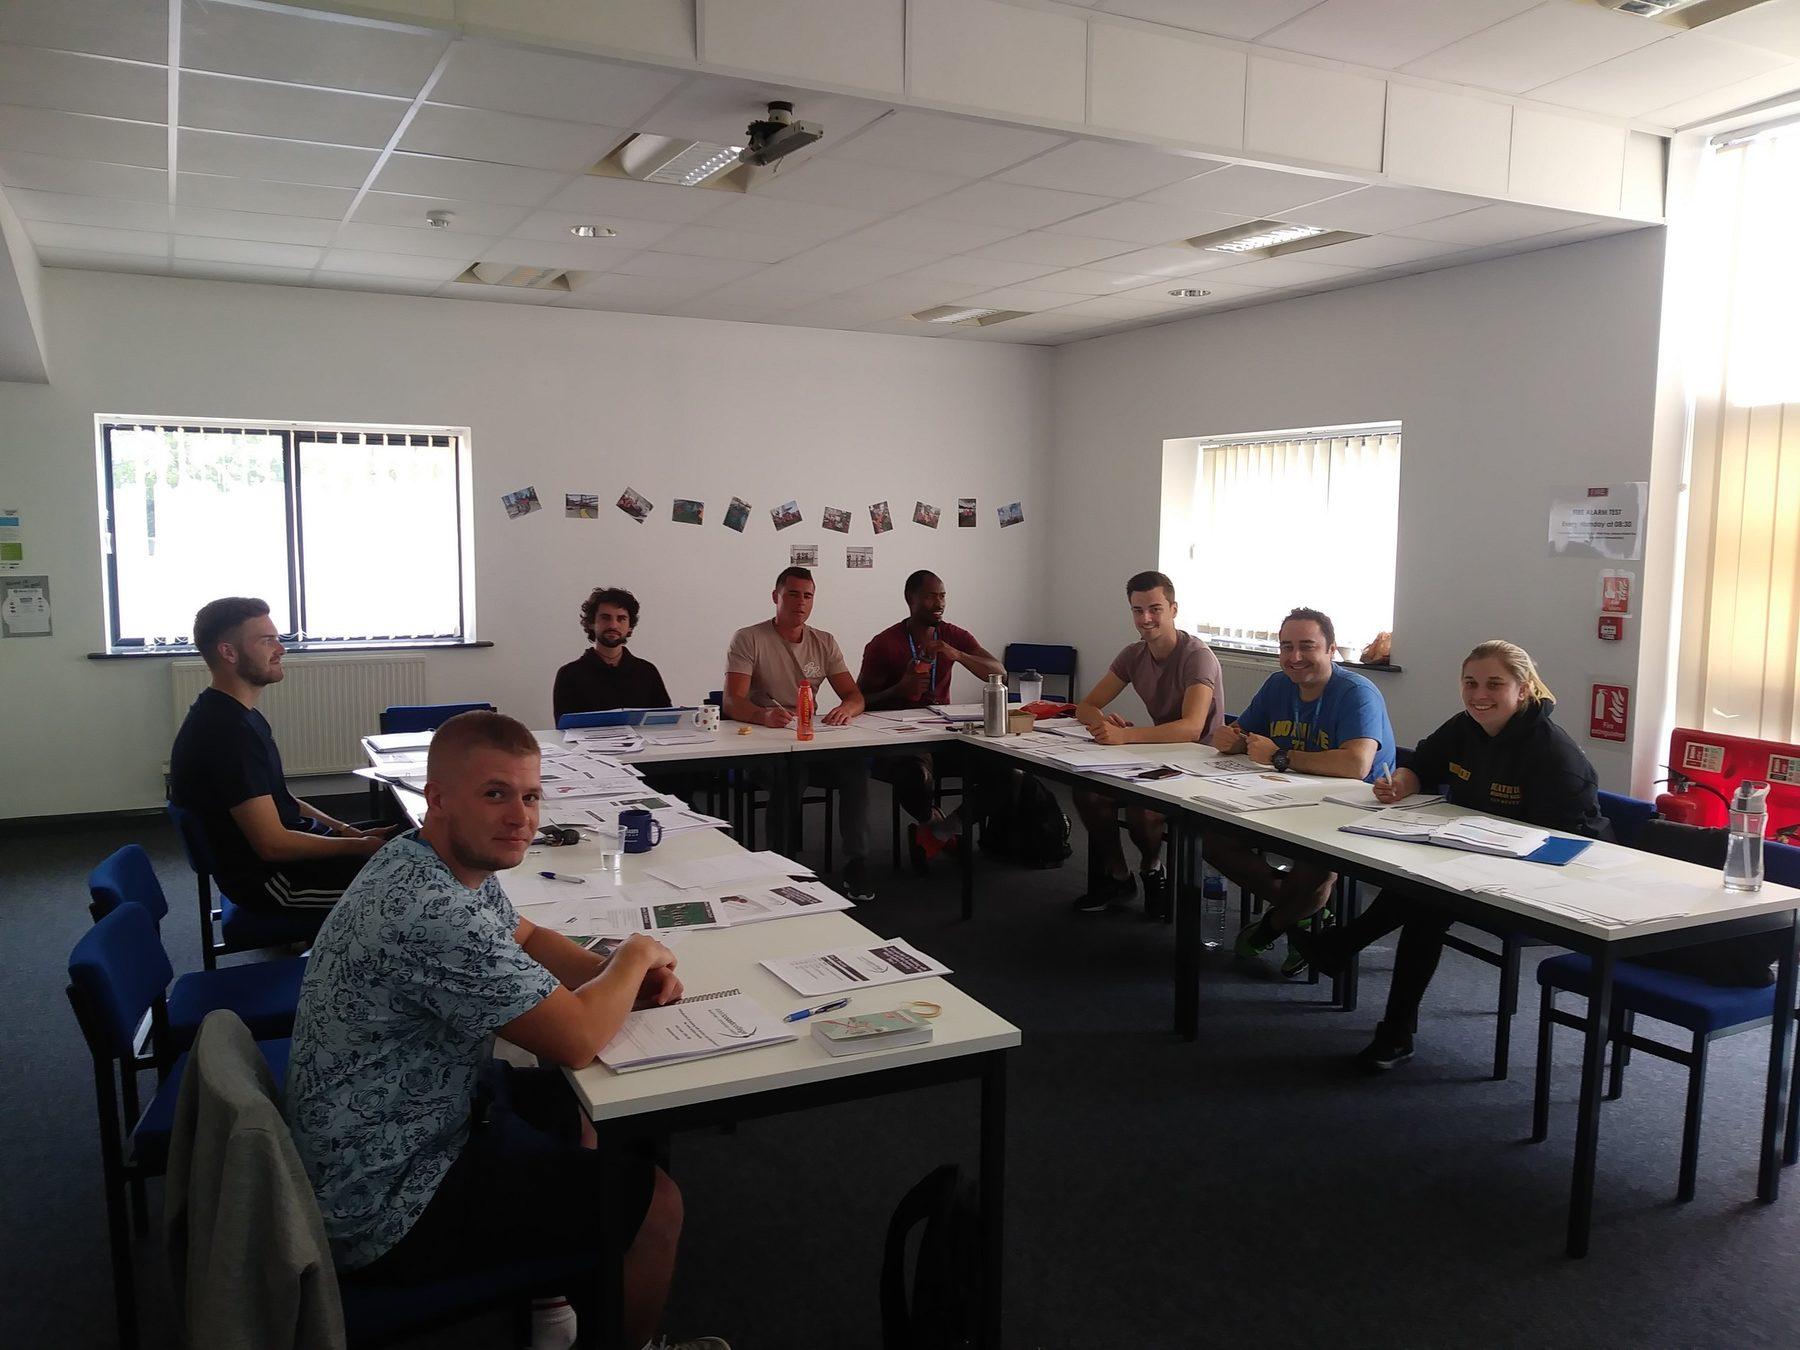 Organisation Image (Offshore Wind Skills Centre: Cohort 4 - Classroom)